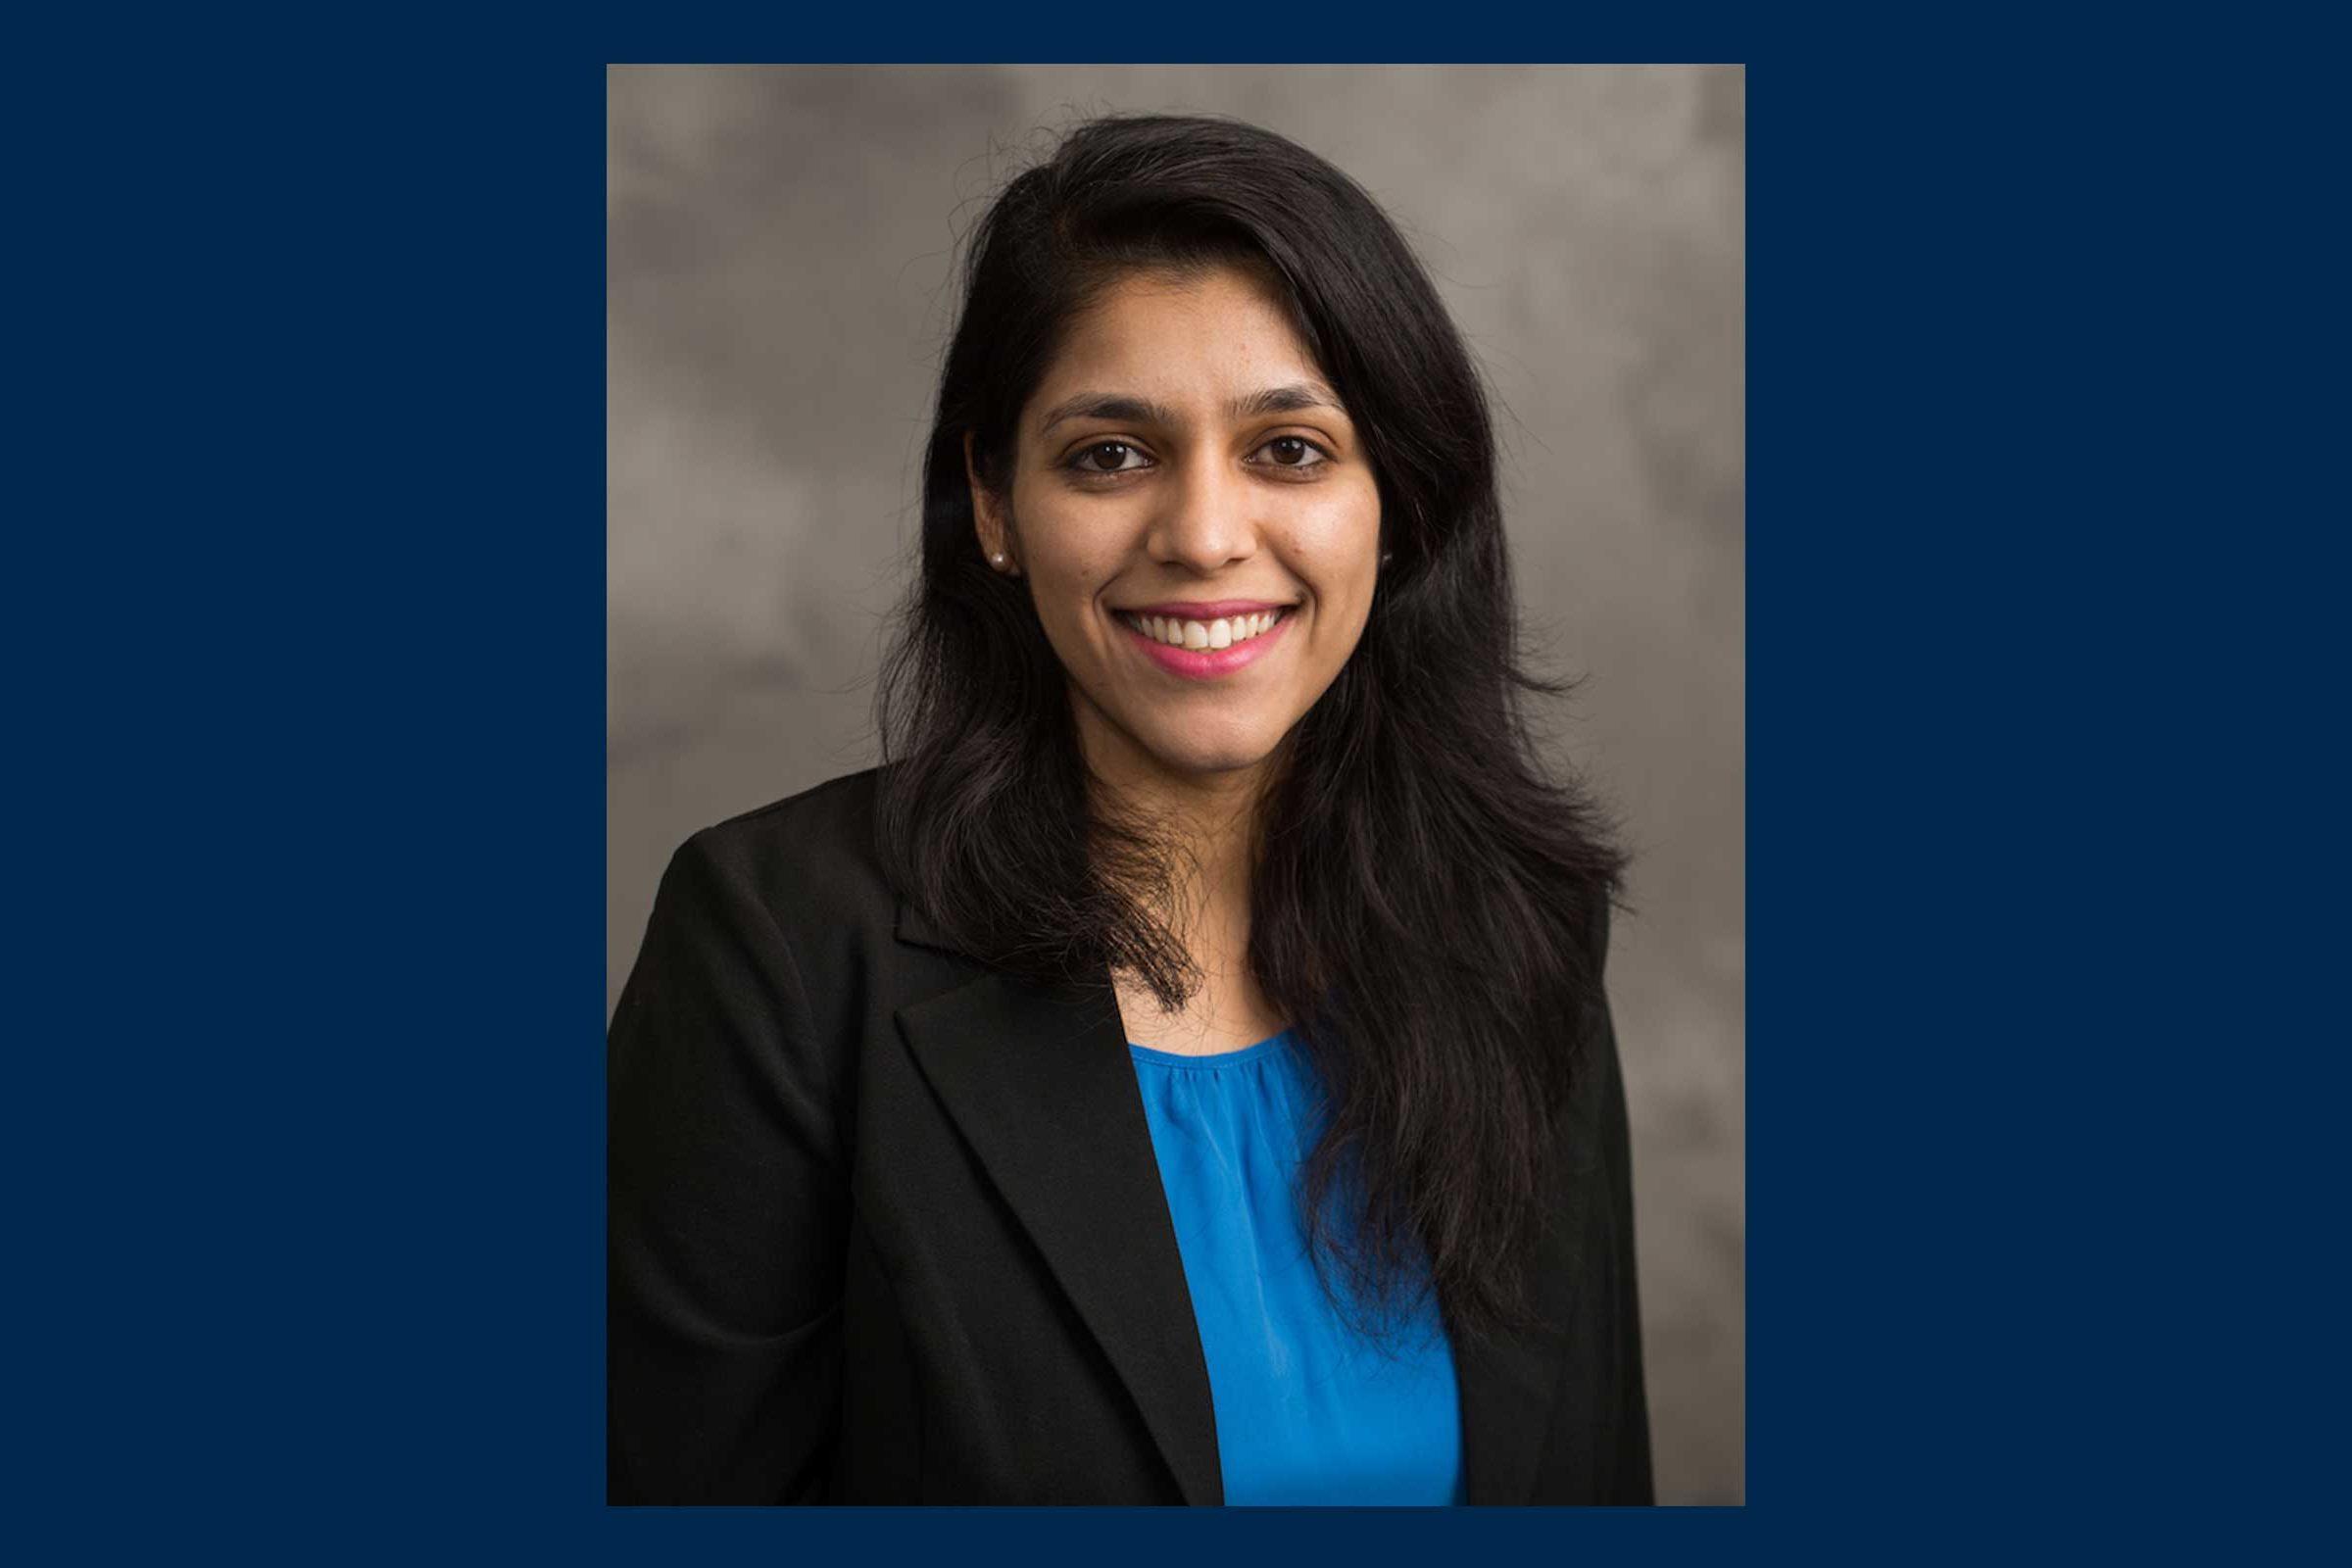 CLASP PhD candidate Garima Malhotra